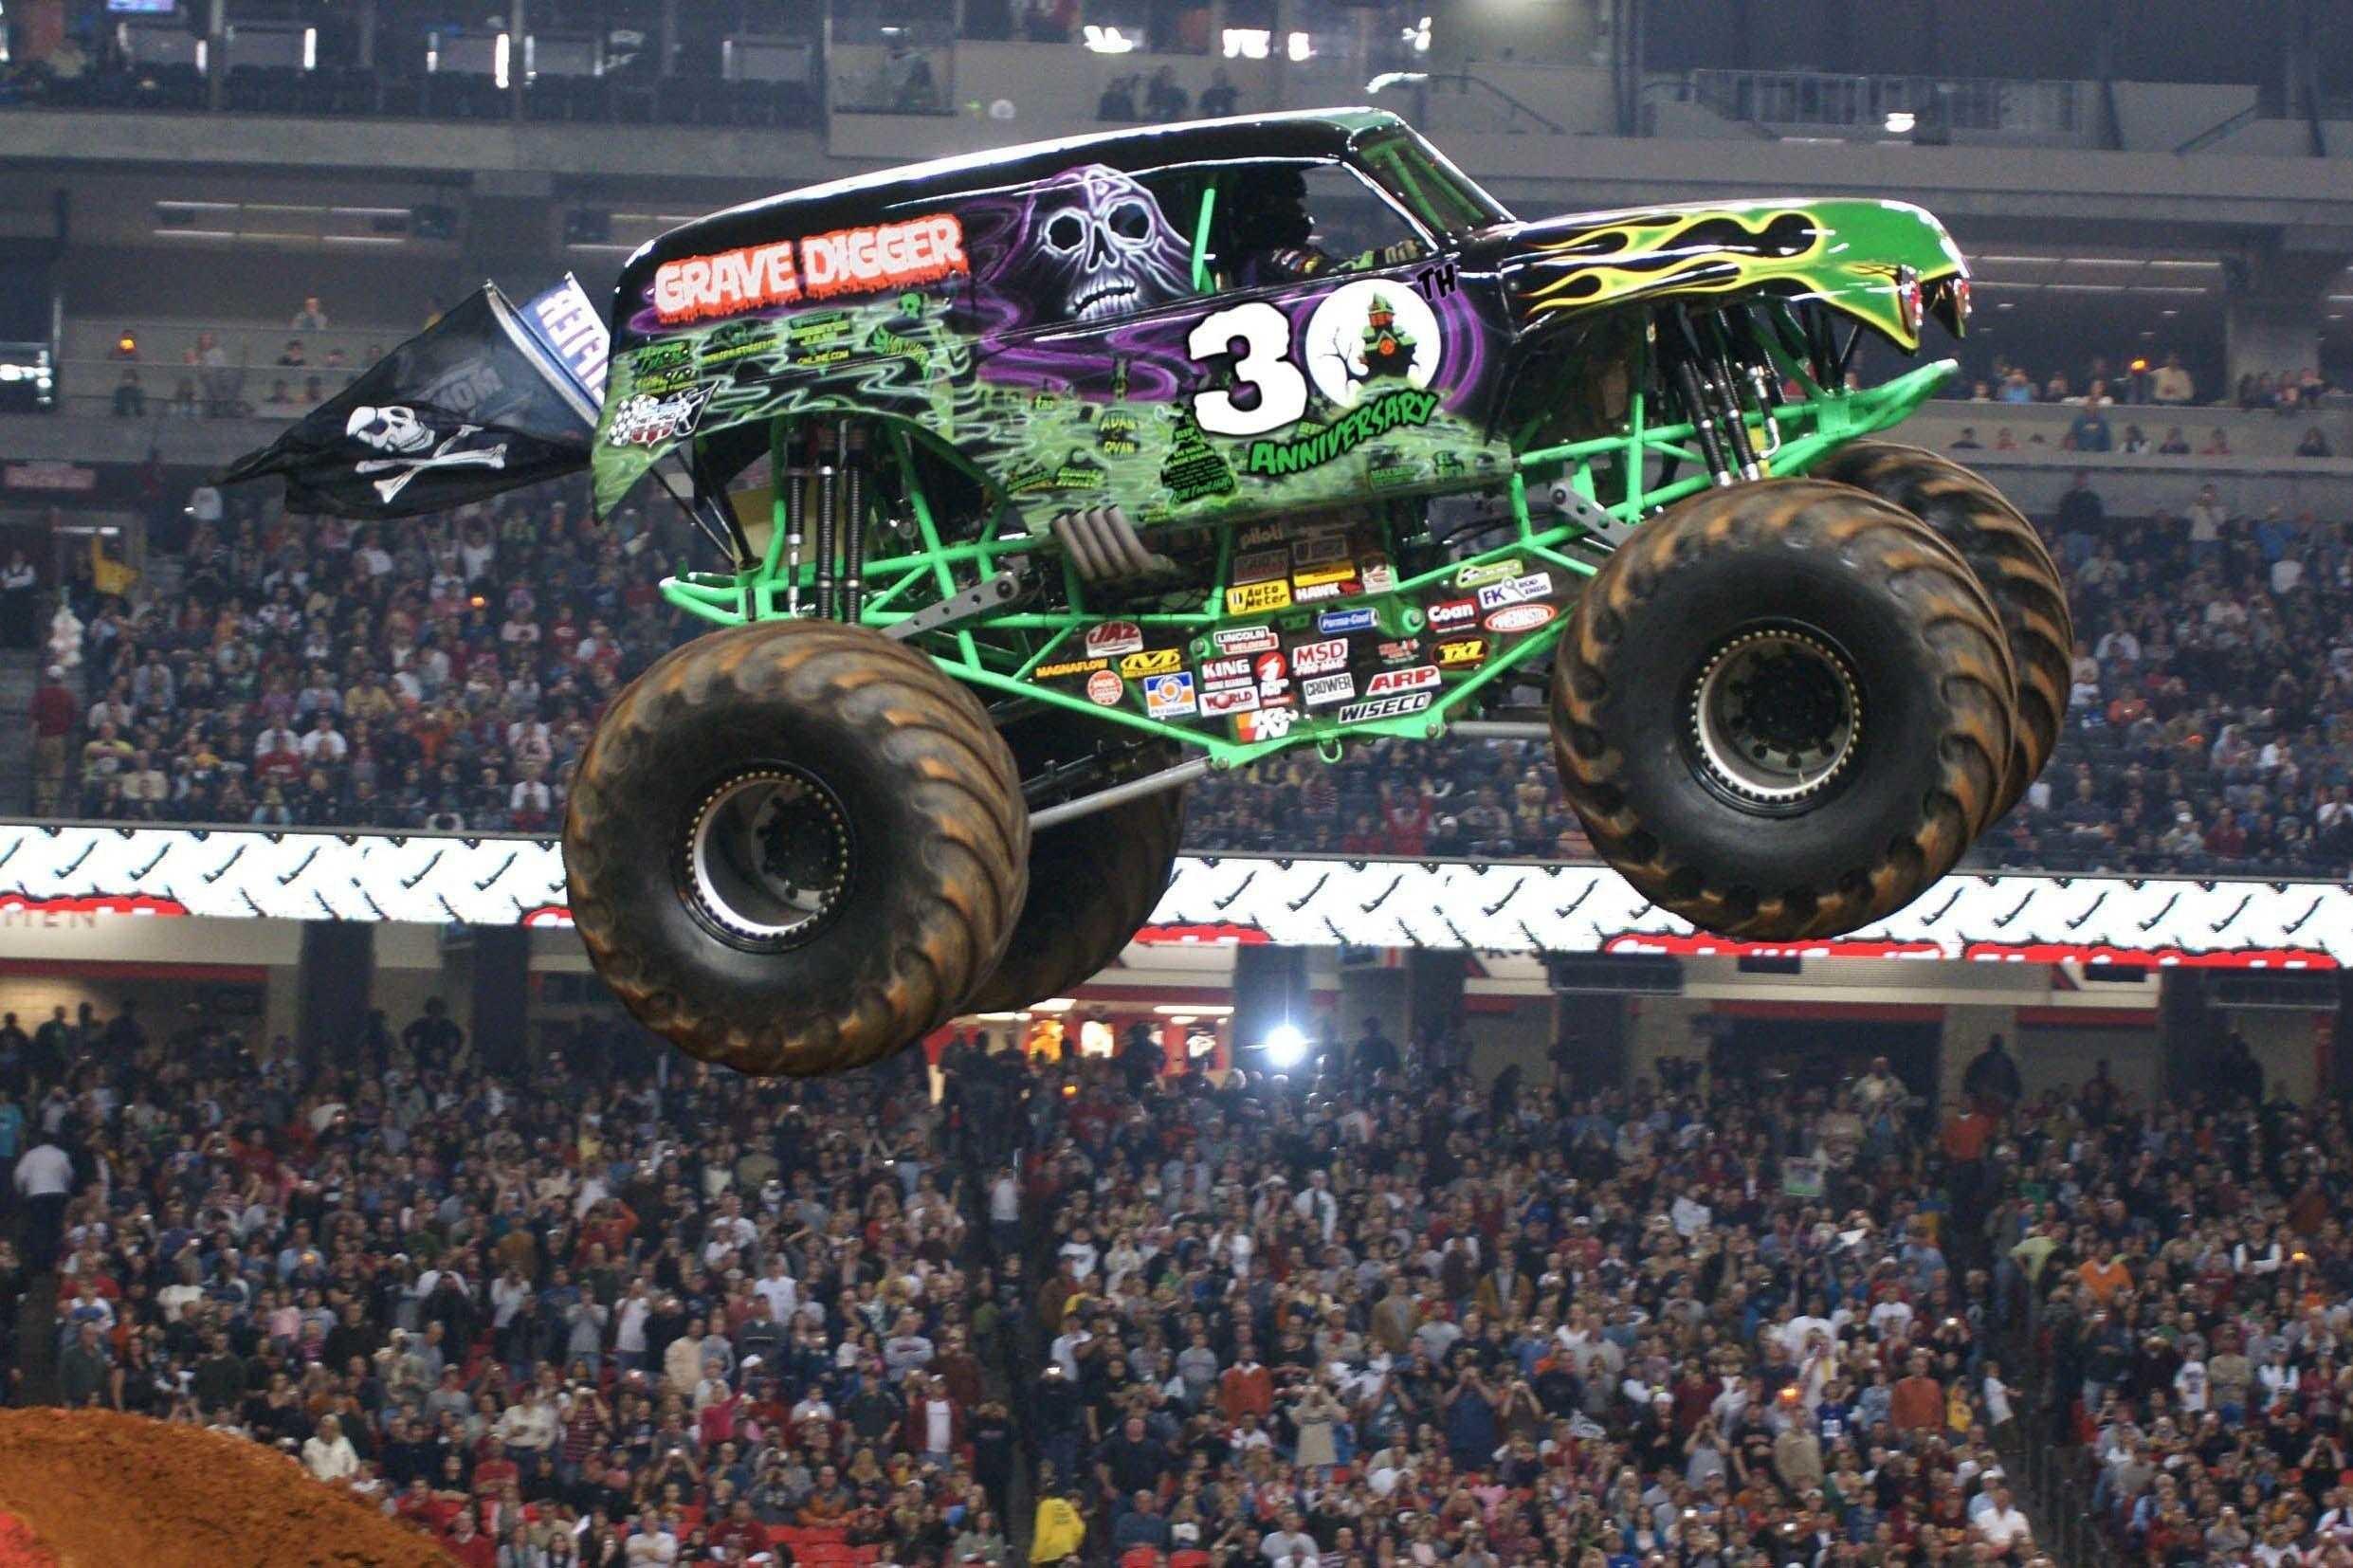 Res: 2482x1654, Monster Trucks Wallpaper Truck For Iphone Hd Pics